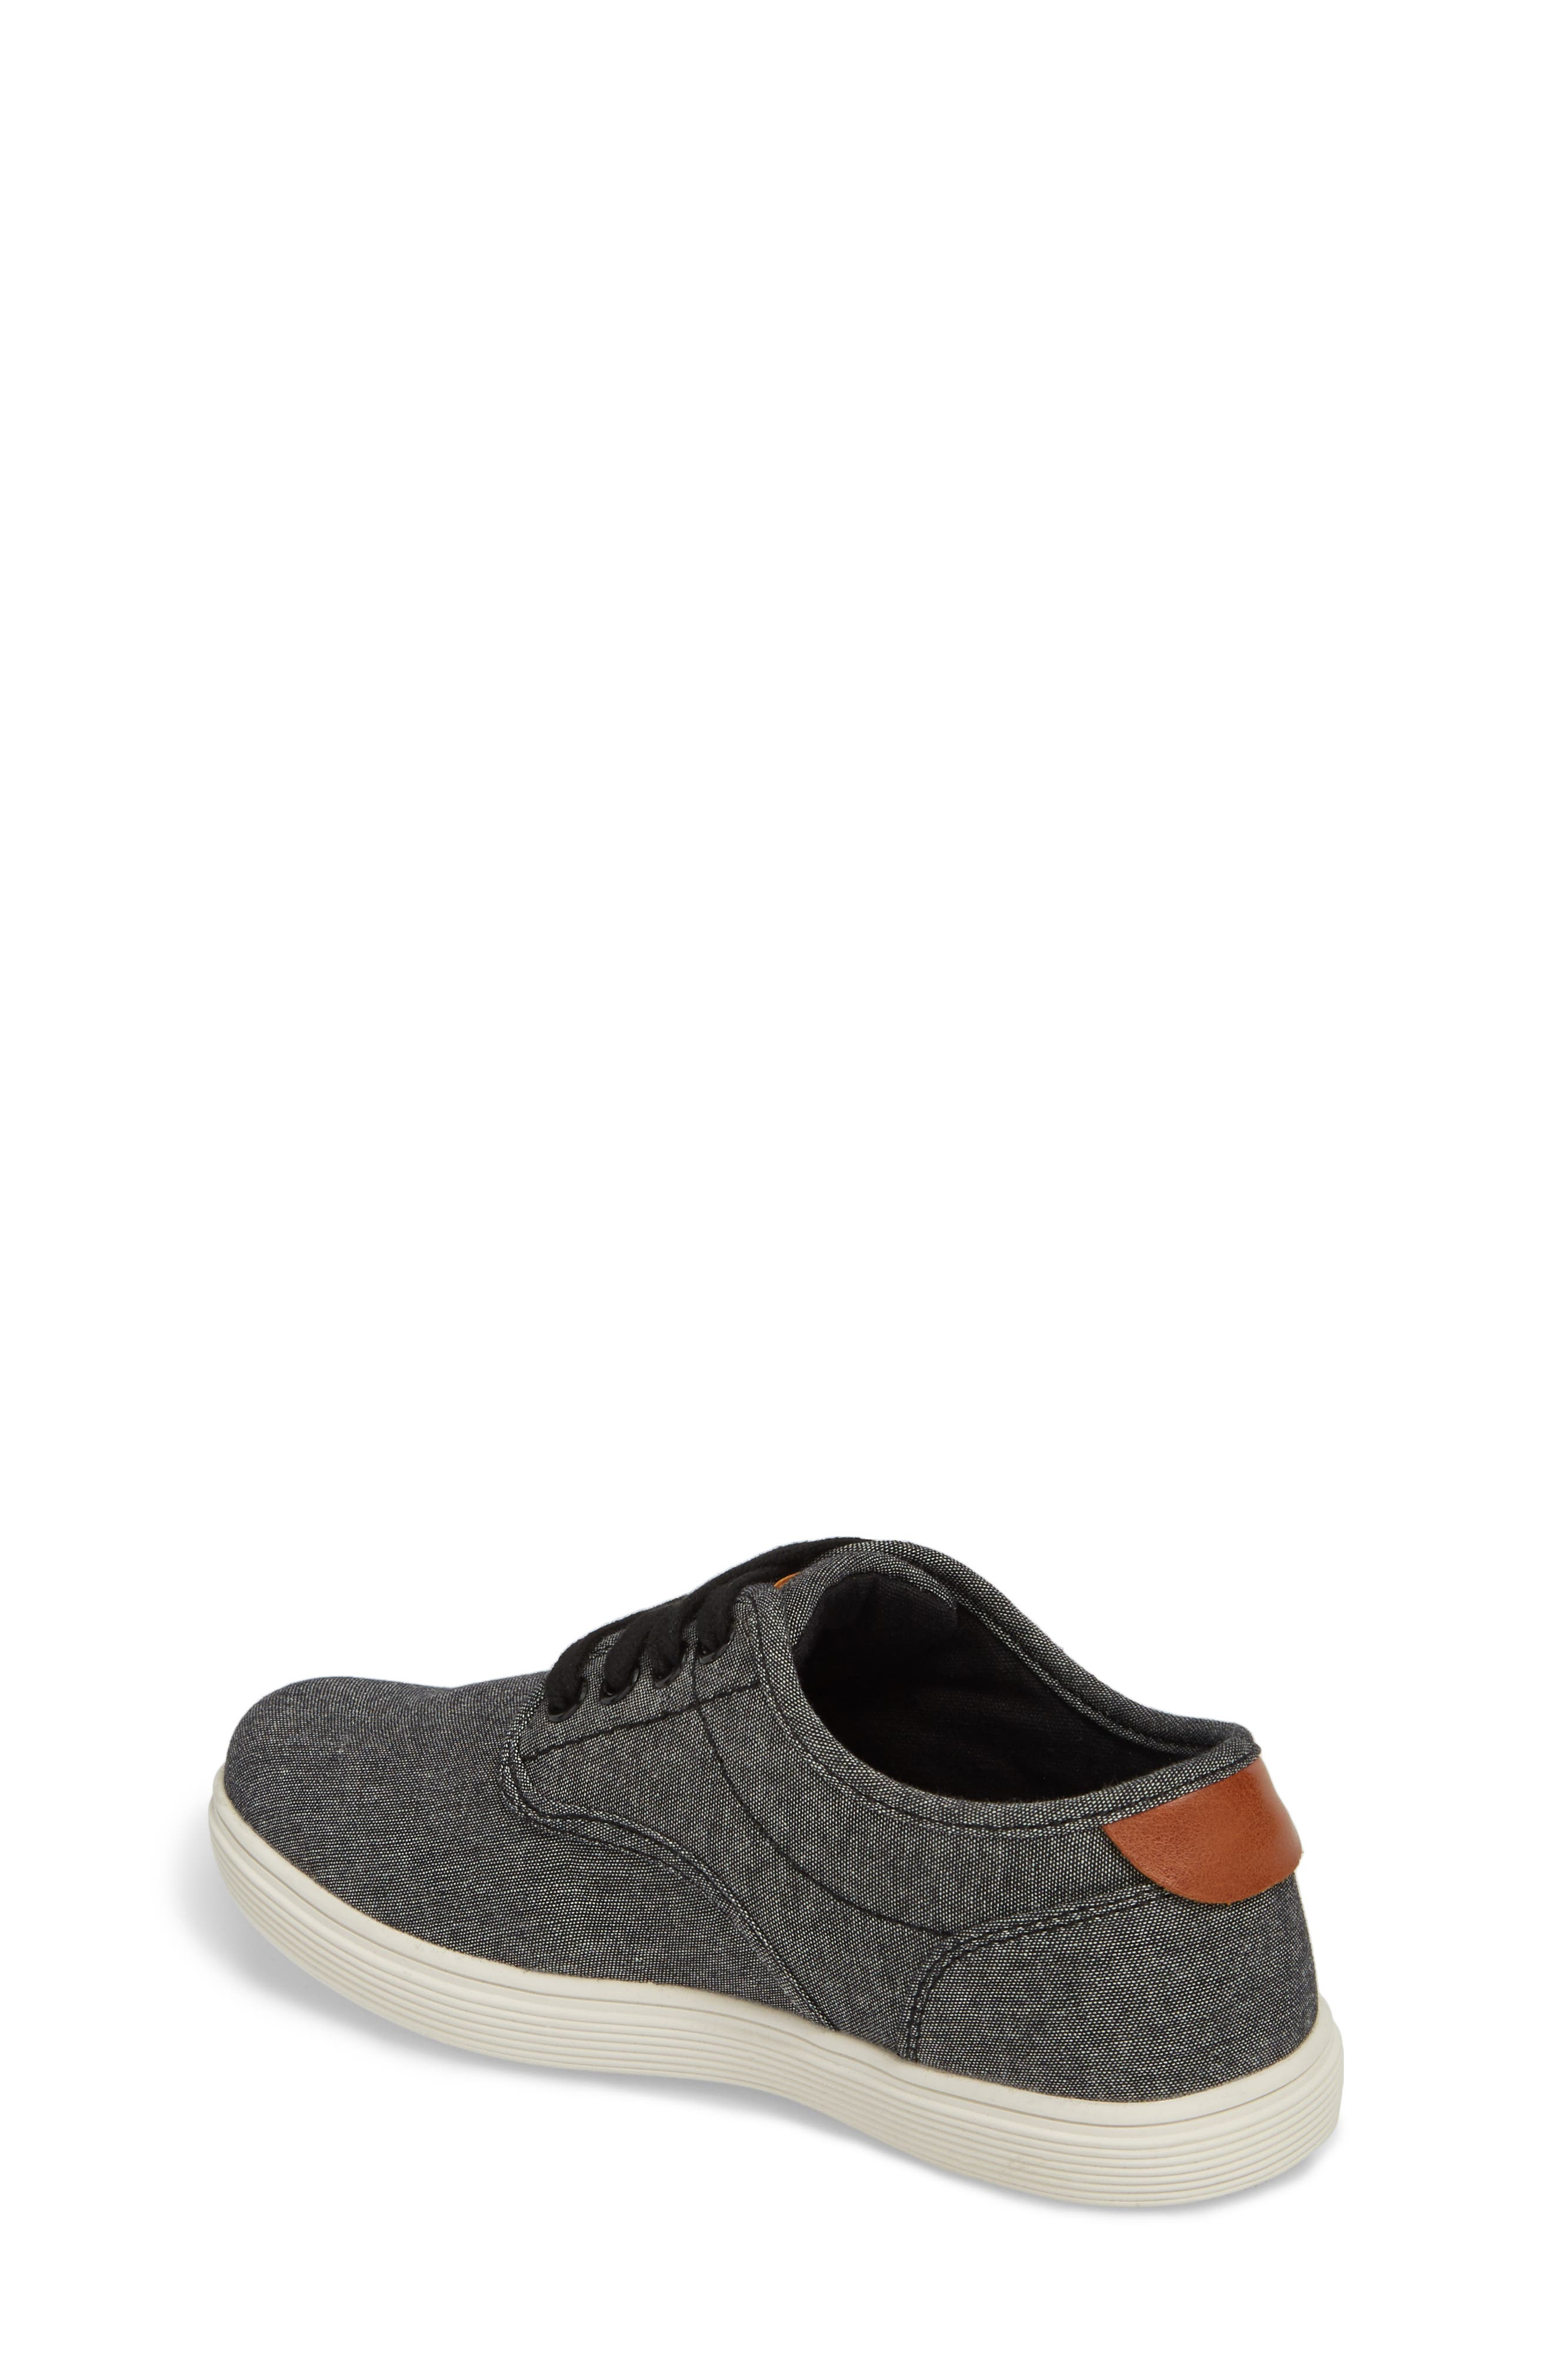 Bfenta Sneaker,                             Alternate thumbnail 2, color,